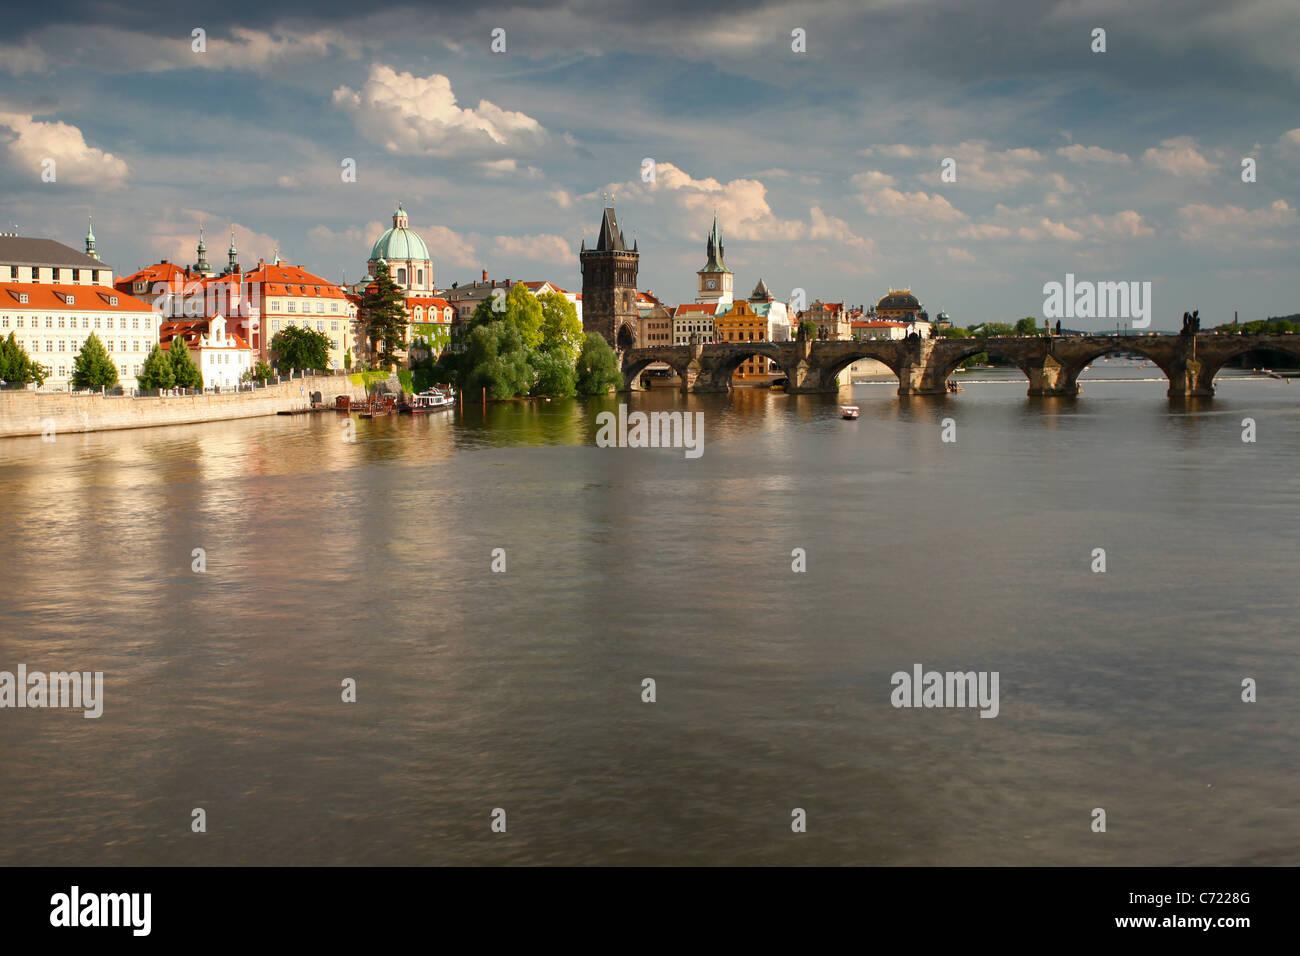 Charles Bridge and the Vltava river, Old Town, Prague, UNESCO World Heritage Site, Czech Republic, Europe - Stock Image